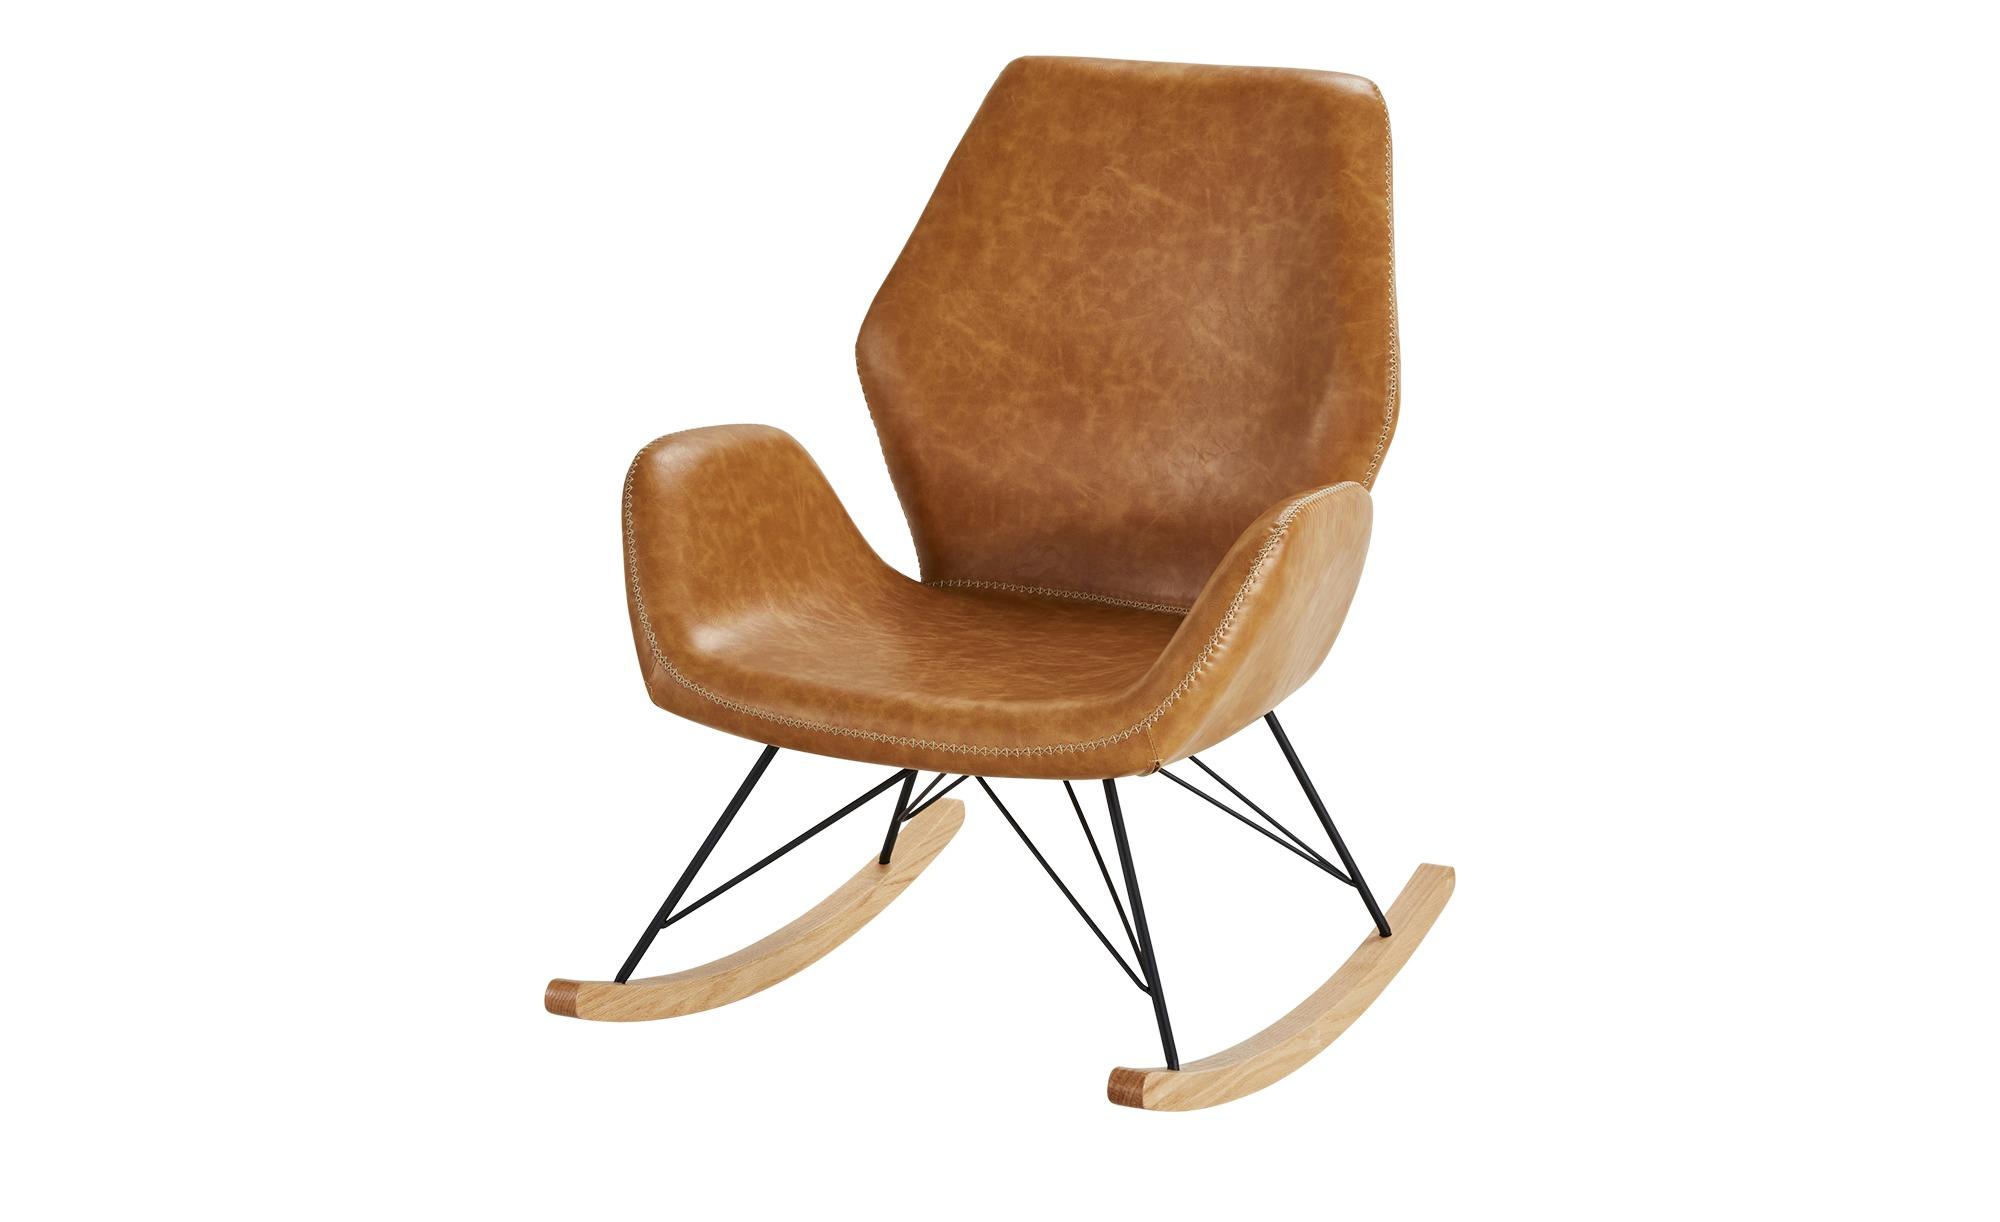 Schaukelsessel braun Theo ¦ braun ¦ Maße (cm): B: 74 H: 94 T: 85 Polstermöbel > Sessel > Polstersessel - Höffner